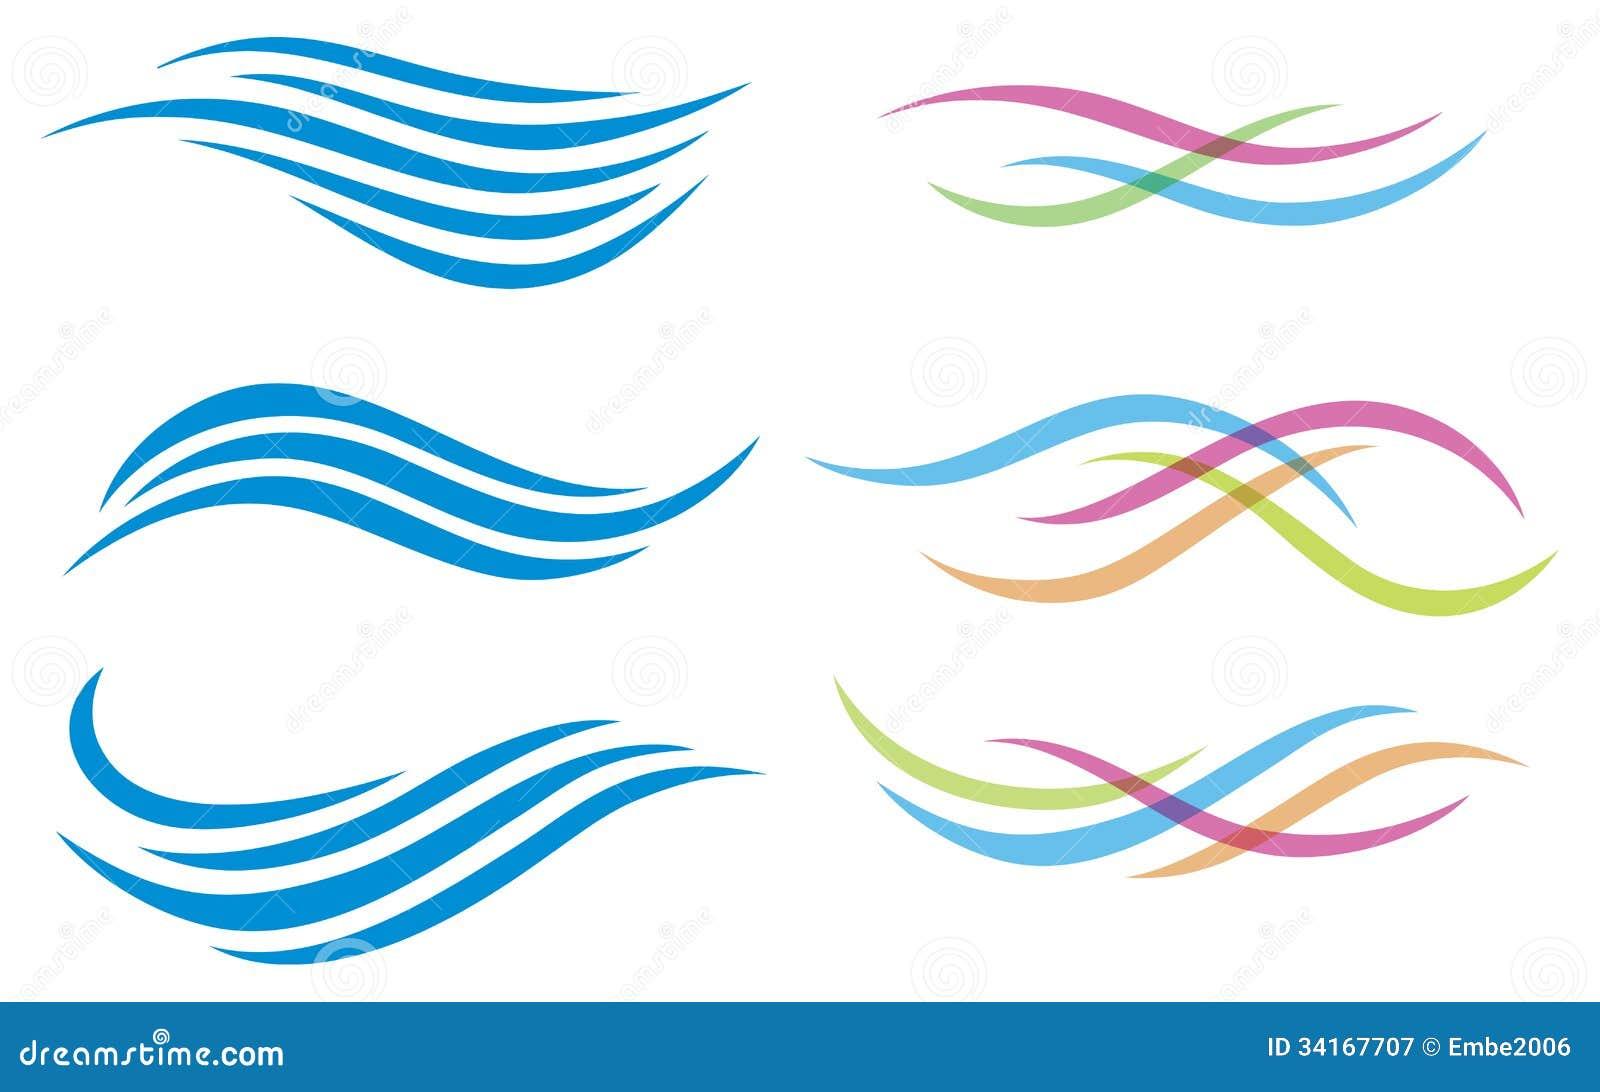 Water Logo Royalty Free Stock Photography - Image: 34167707